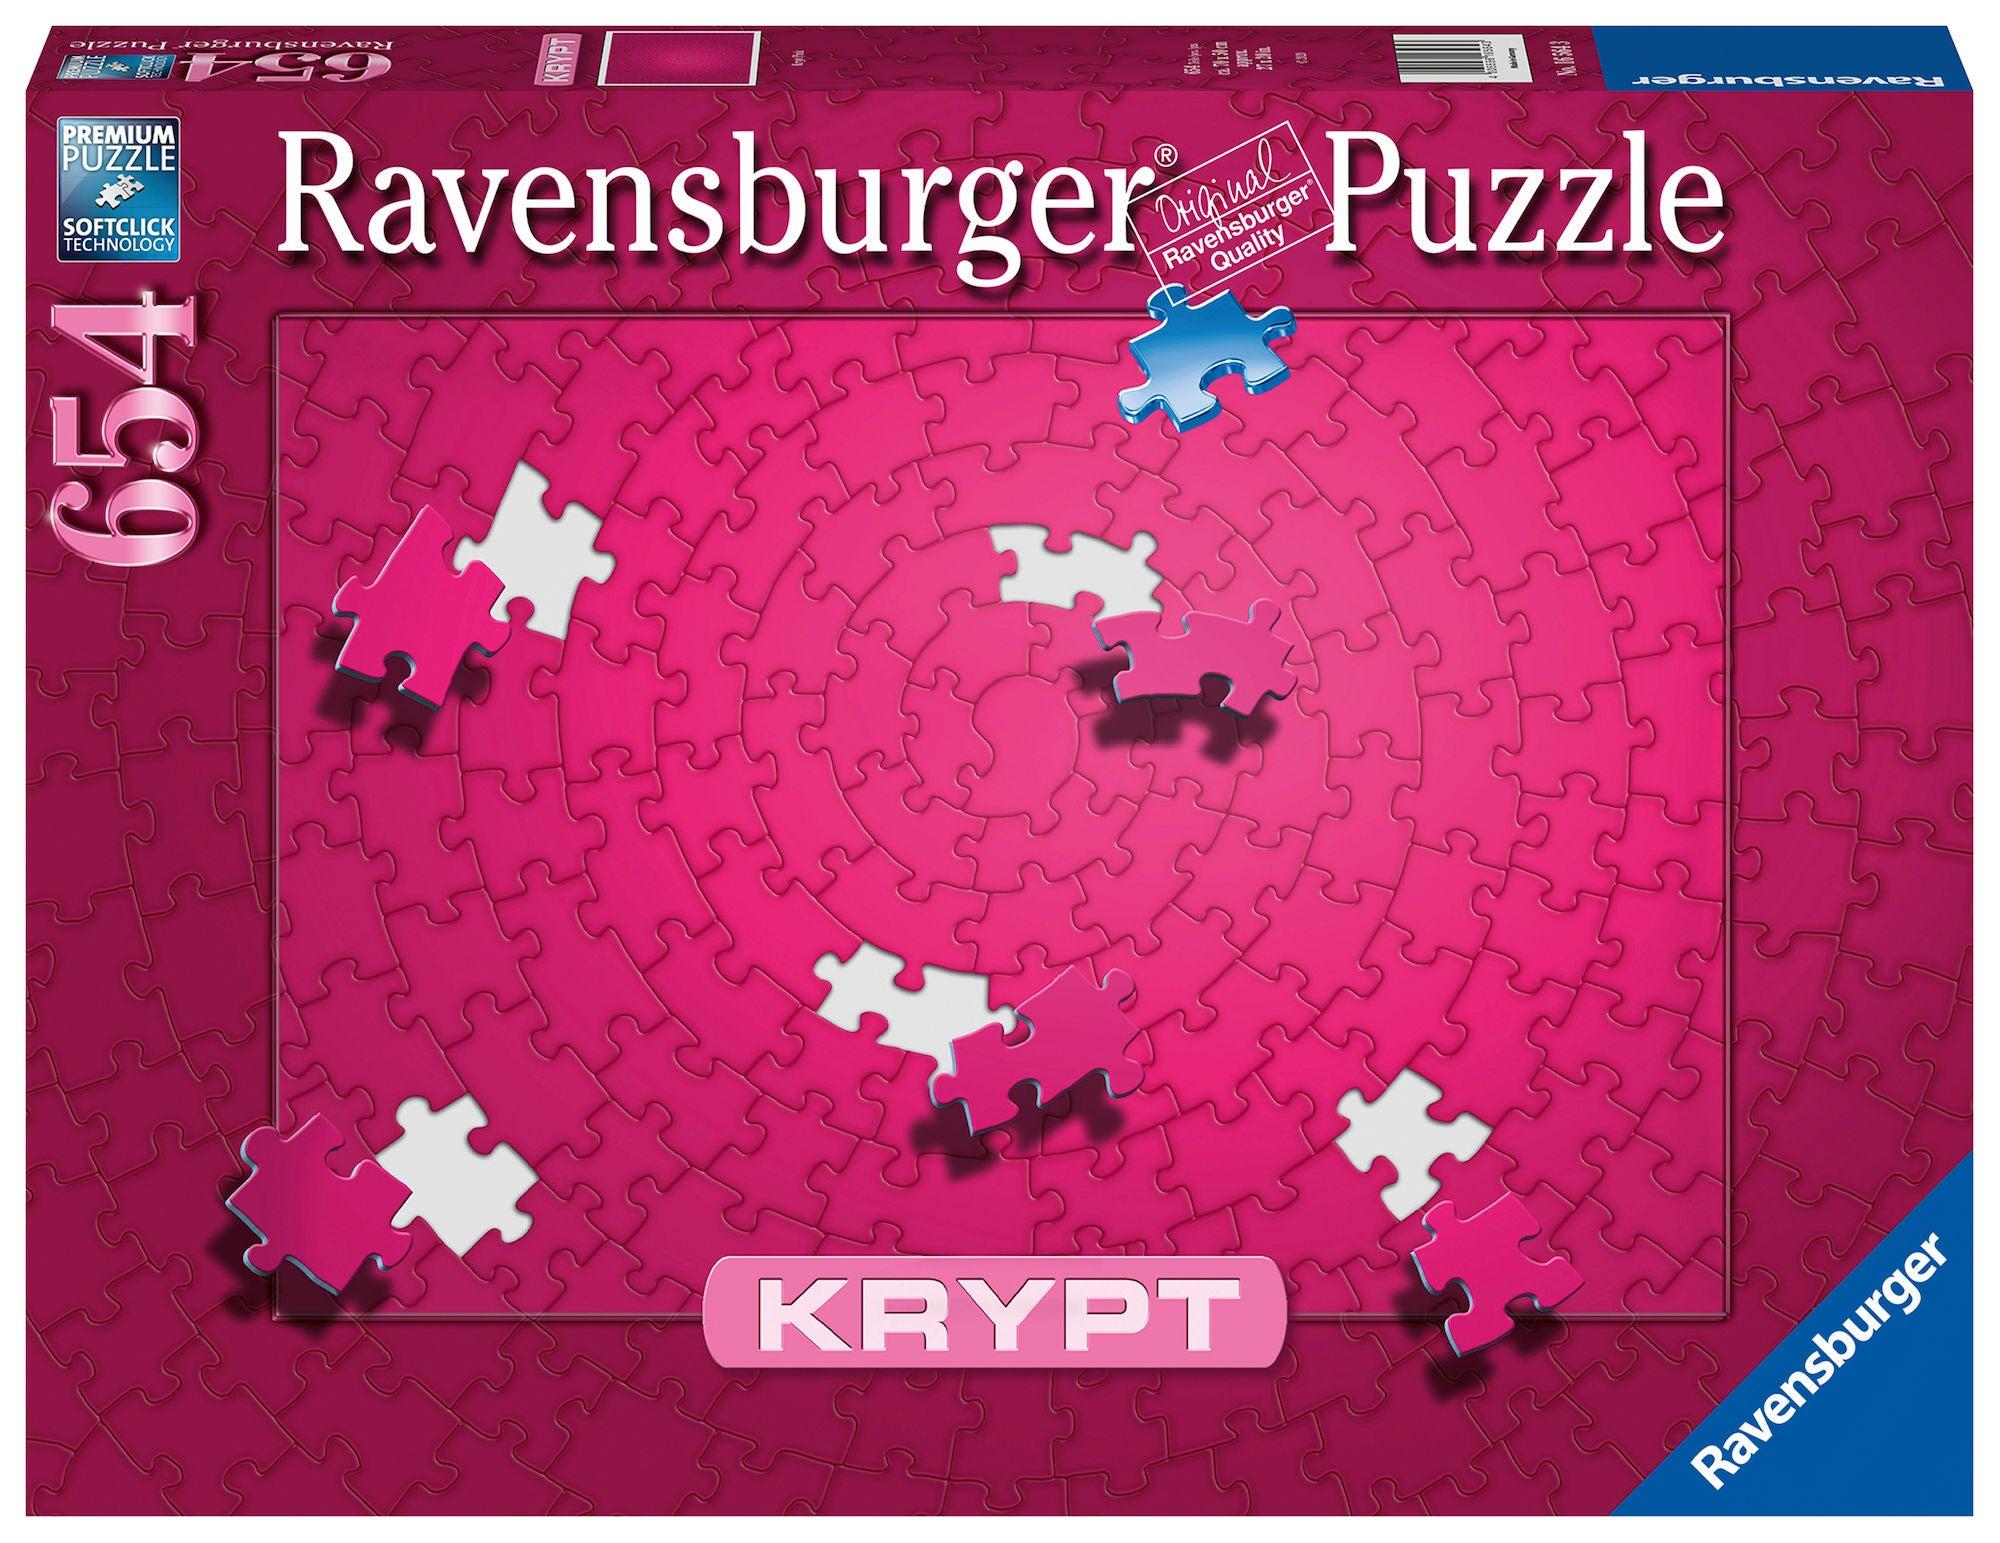 Ravensburger Pussel Krypt Pink 654 Bitar